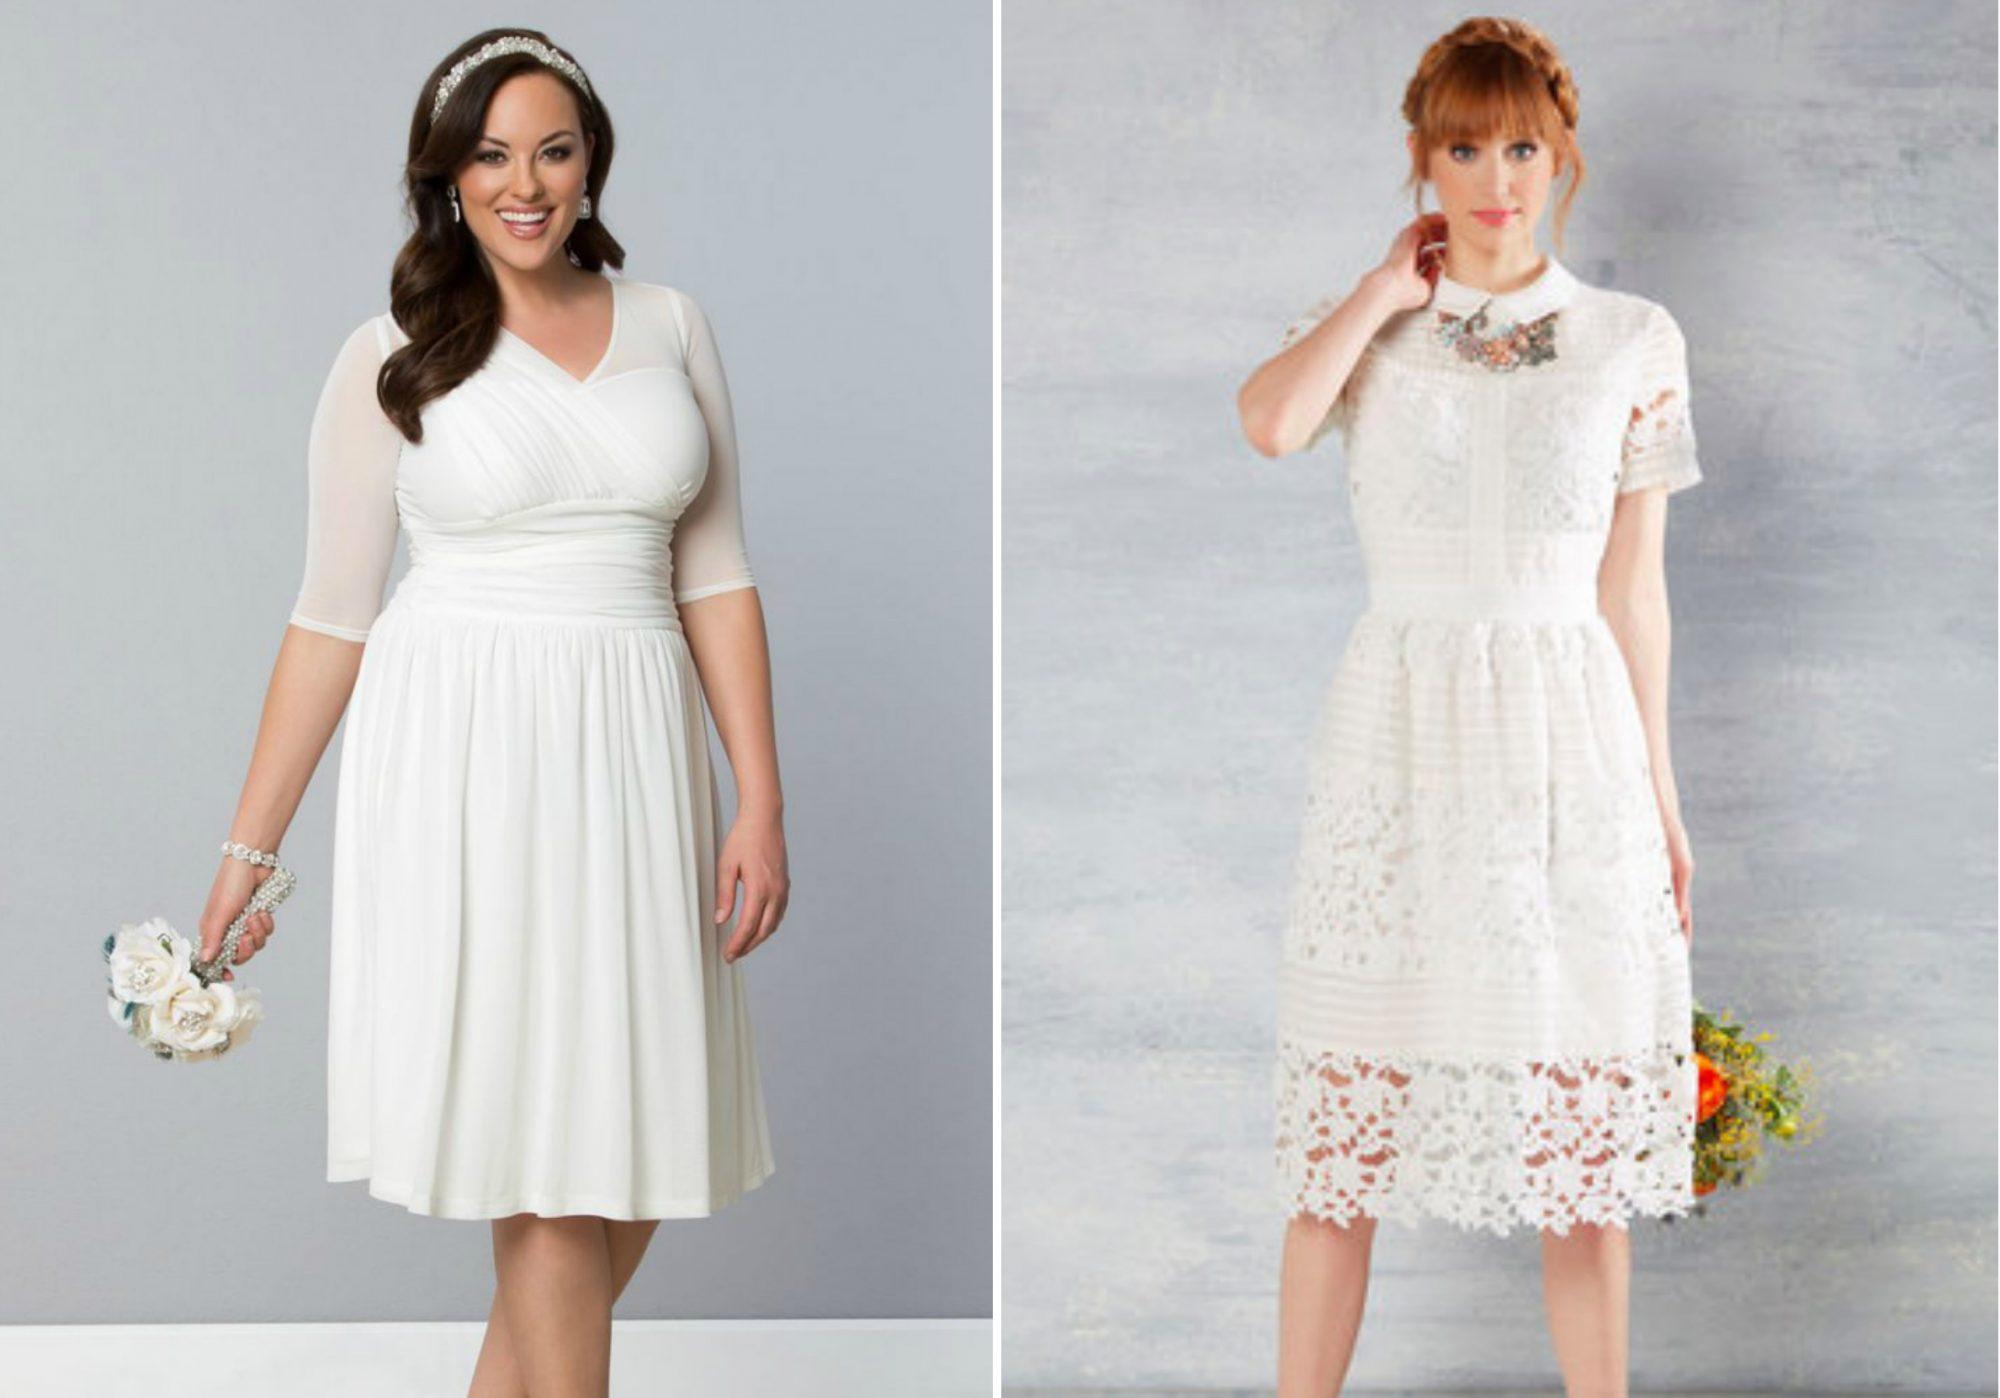 wedding-dresses-work-plus-modcloth